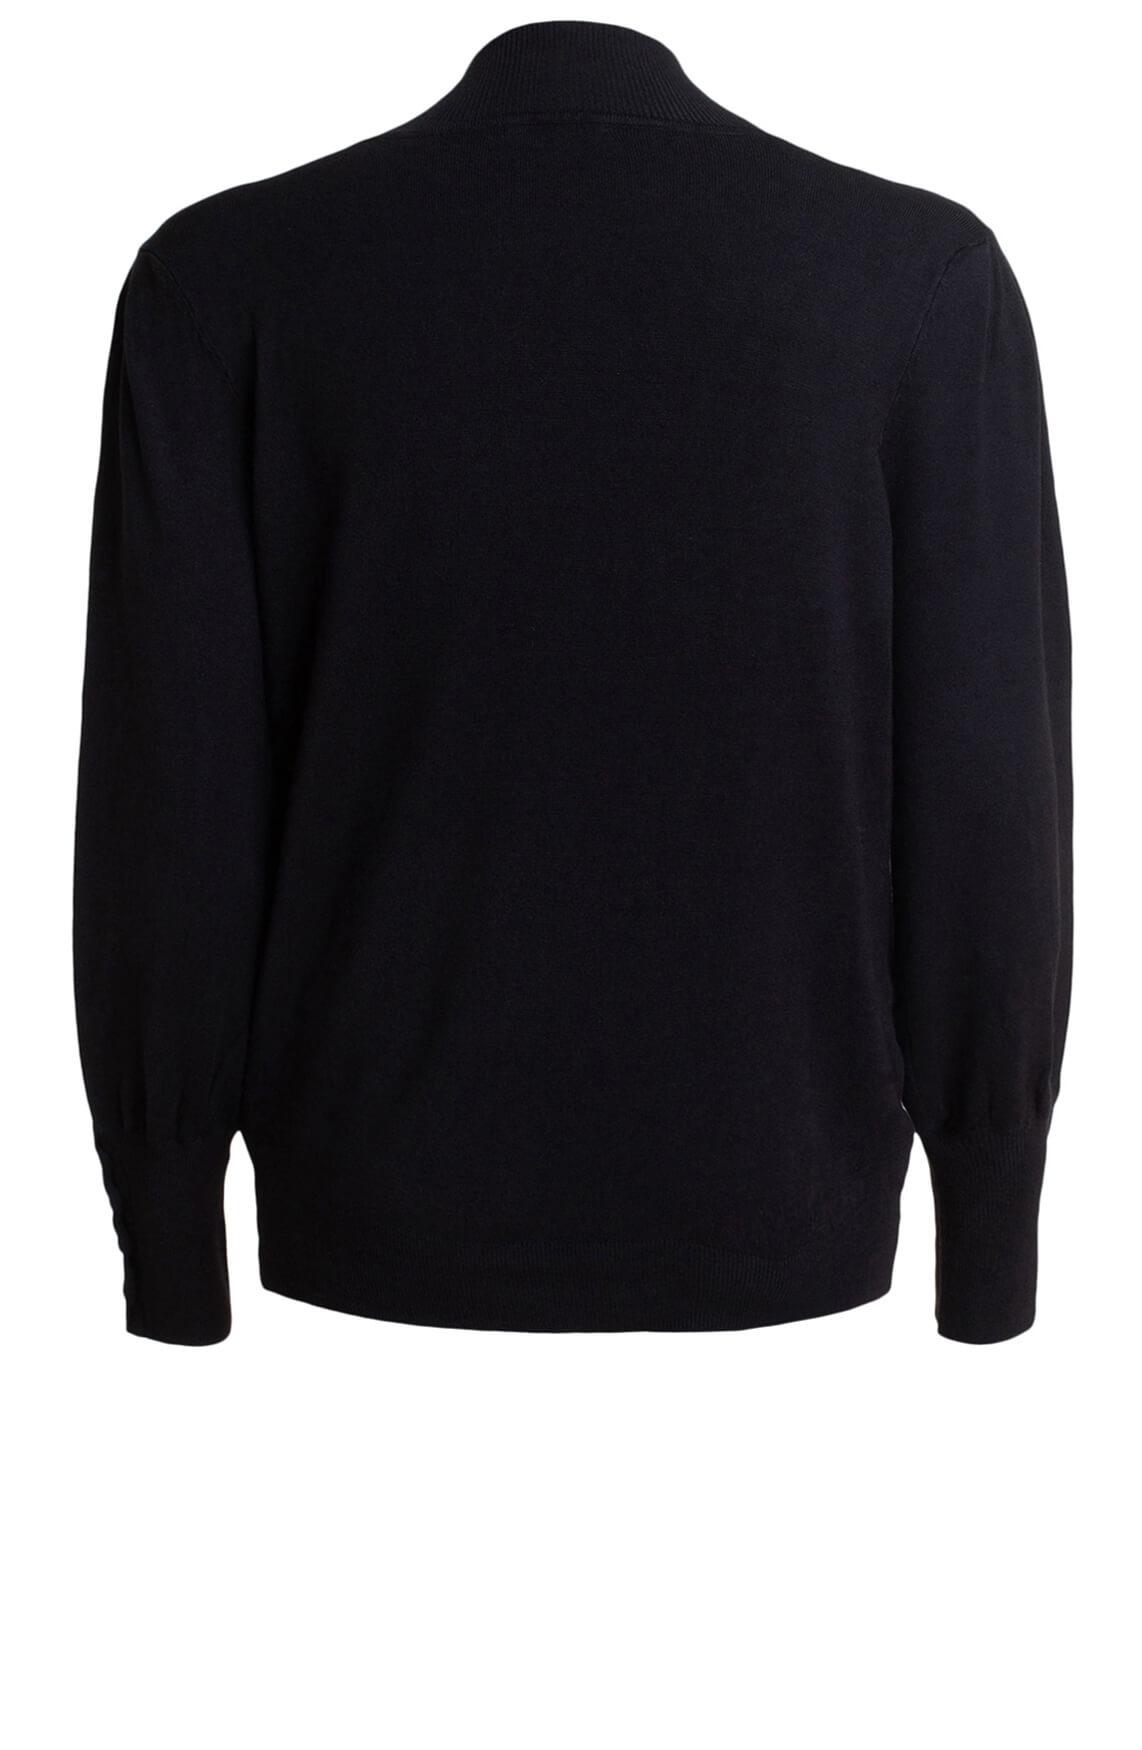 Anna Dames Oversized pullover zwart